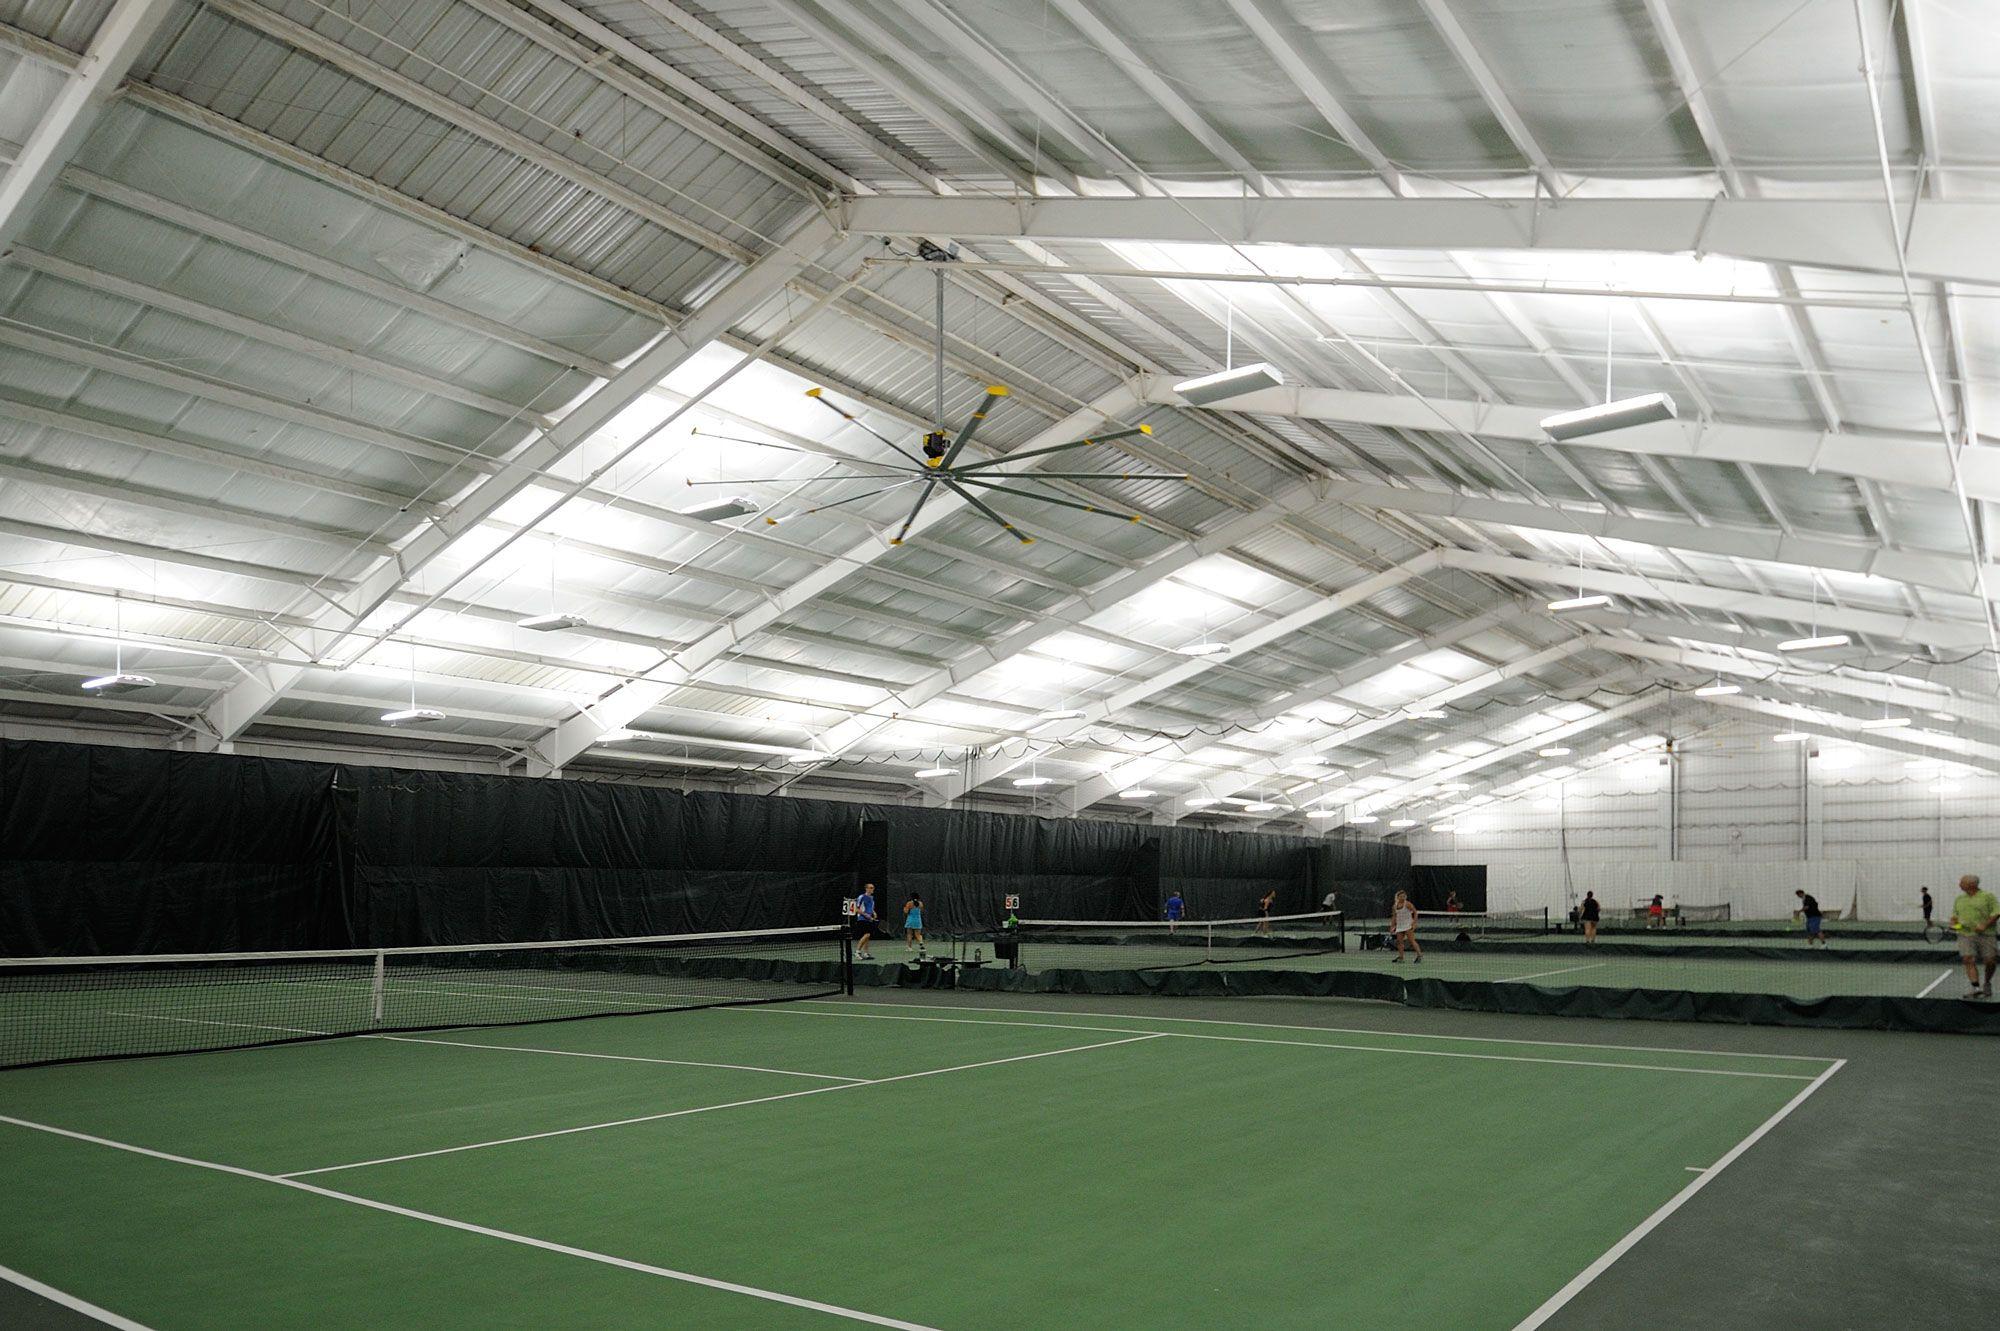 Lexington Tennis Club s spacious facilities – 15 courts spread